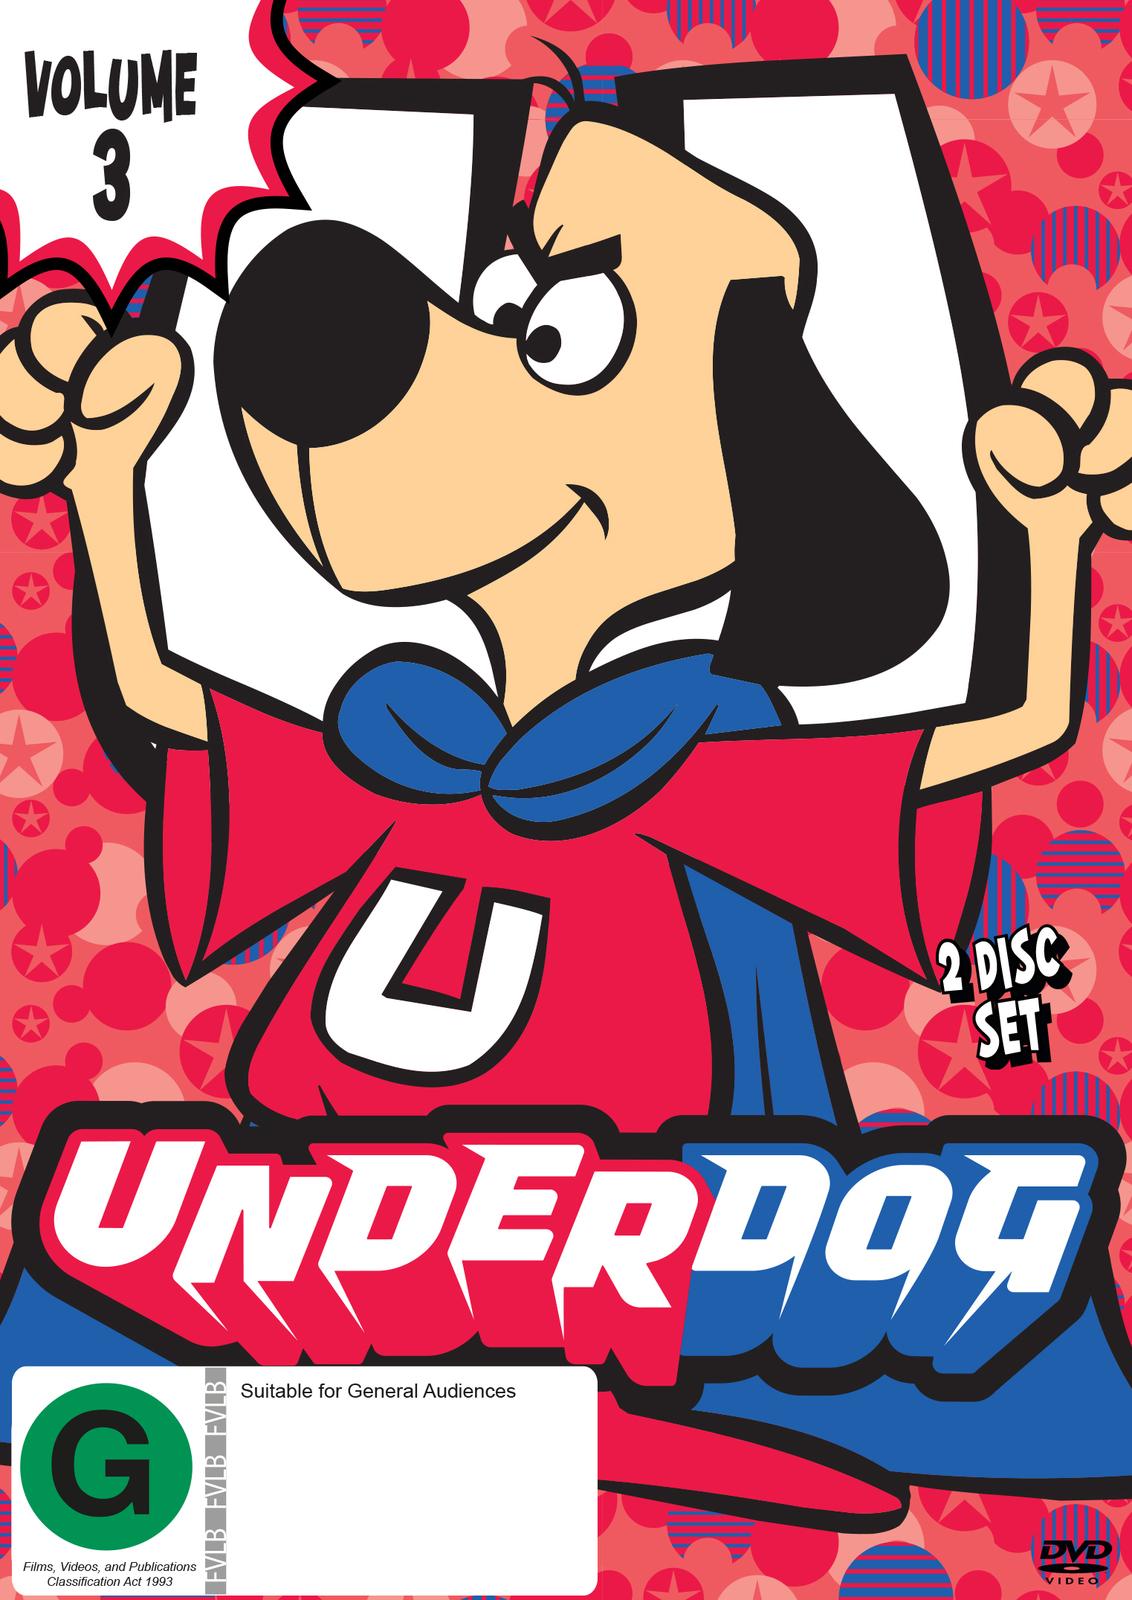 The Underdog Show - Volume 3 on DVD image